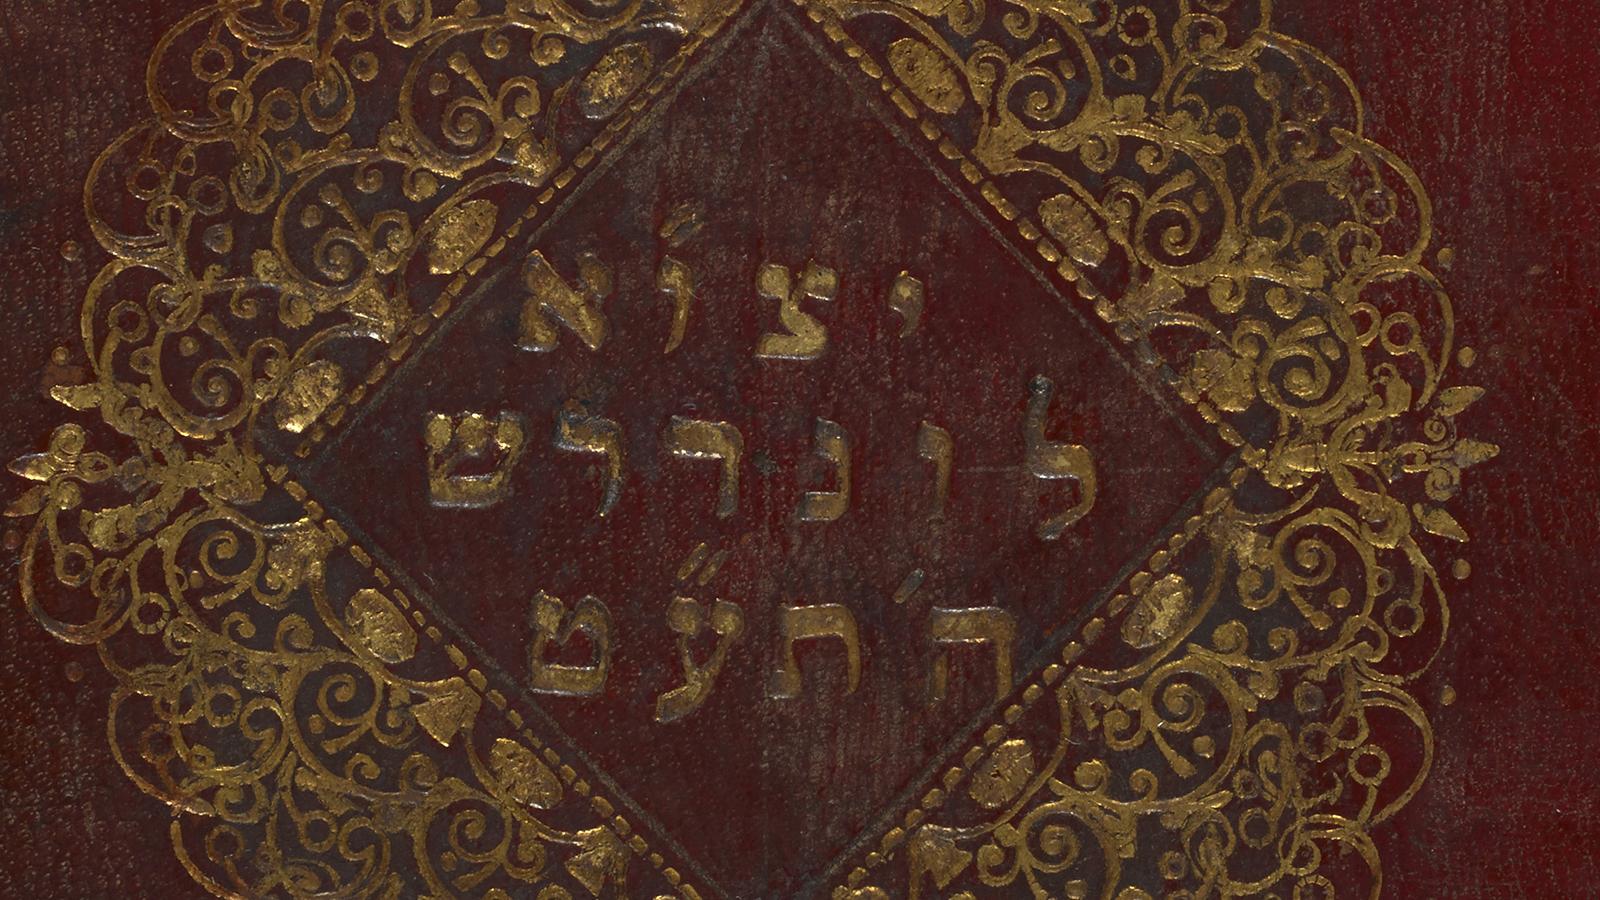 The Digital Life of a Hebrew Manuscript: Application of 3D Imaging at the British Library (Kristin Phelps and Adi Keinan-Schoonbaert)